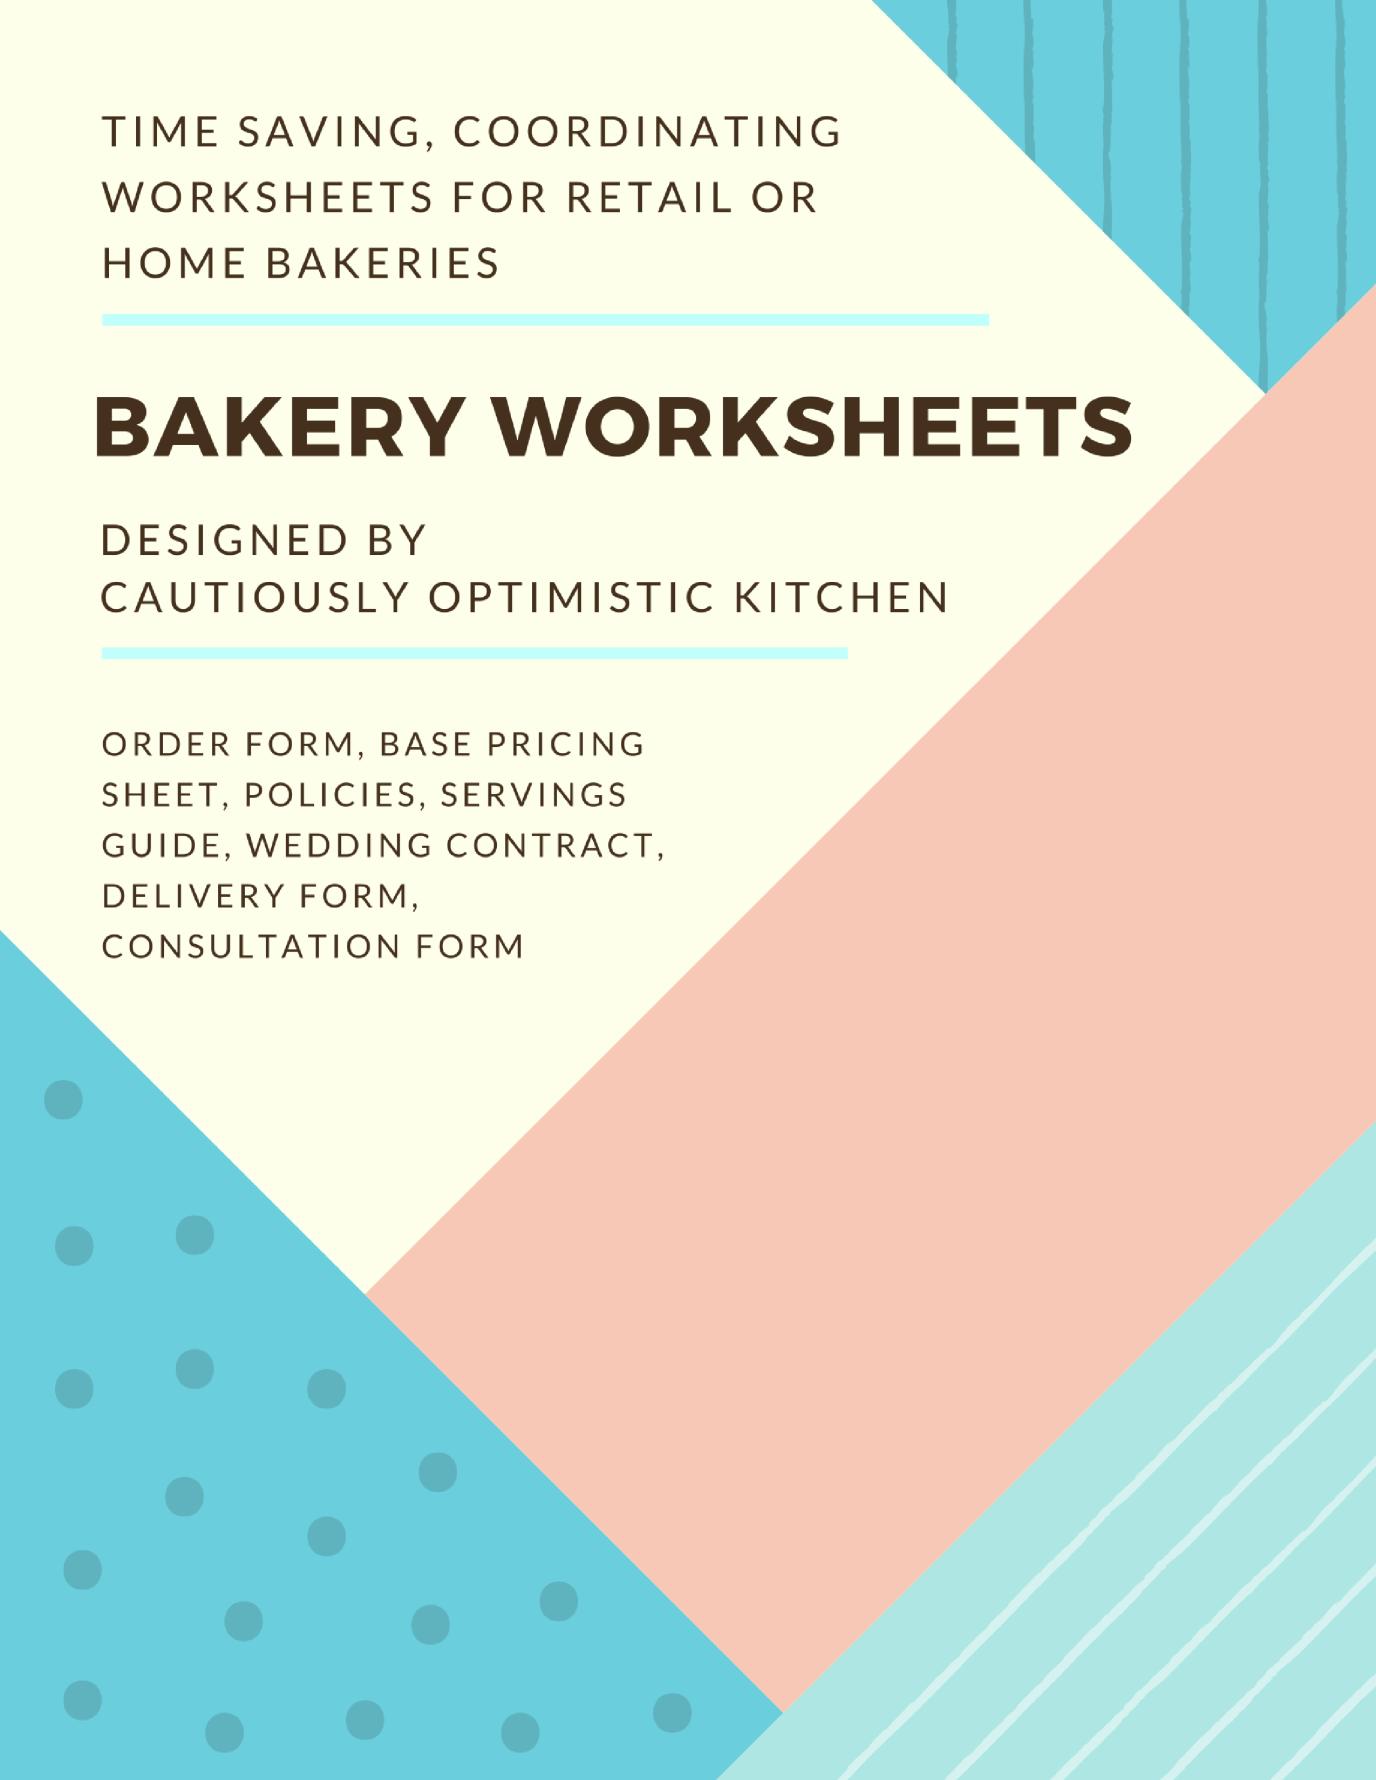 Bakery Worksheets Packet In